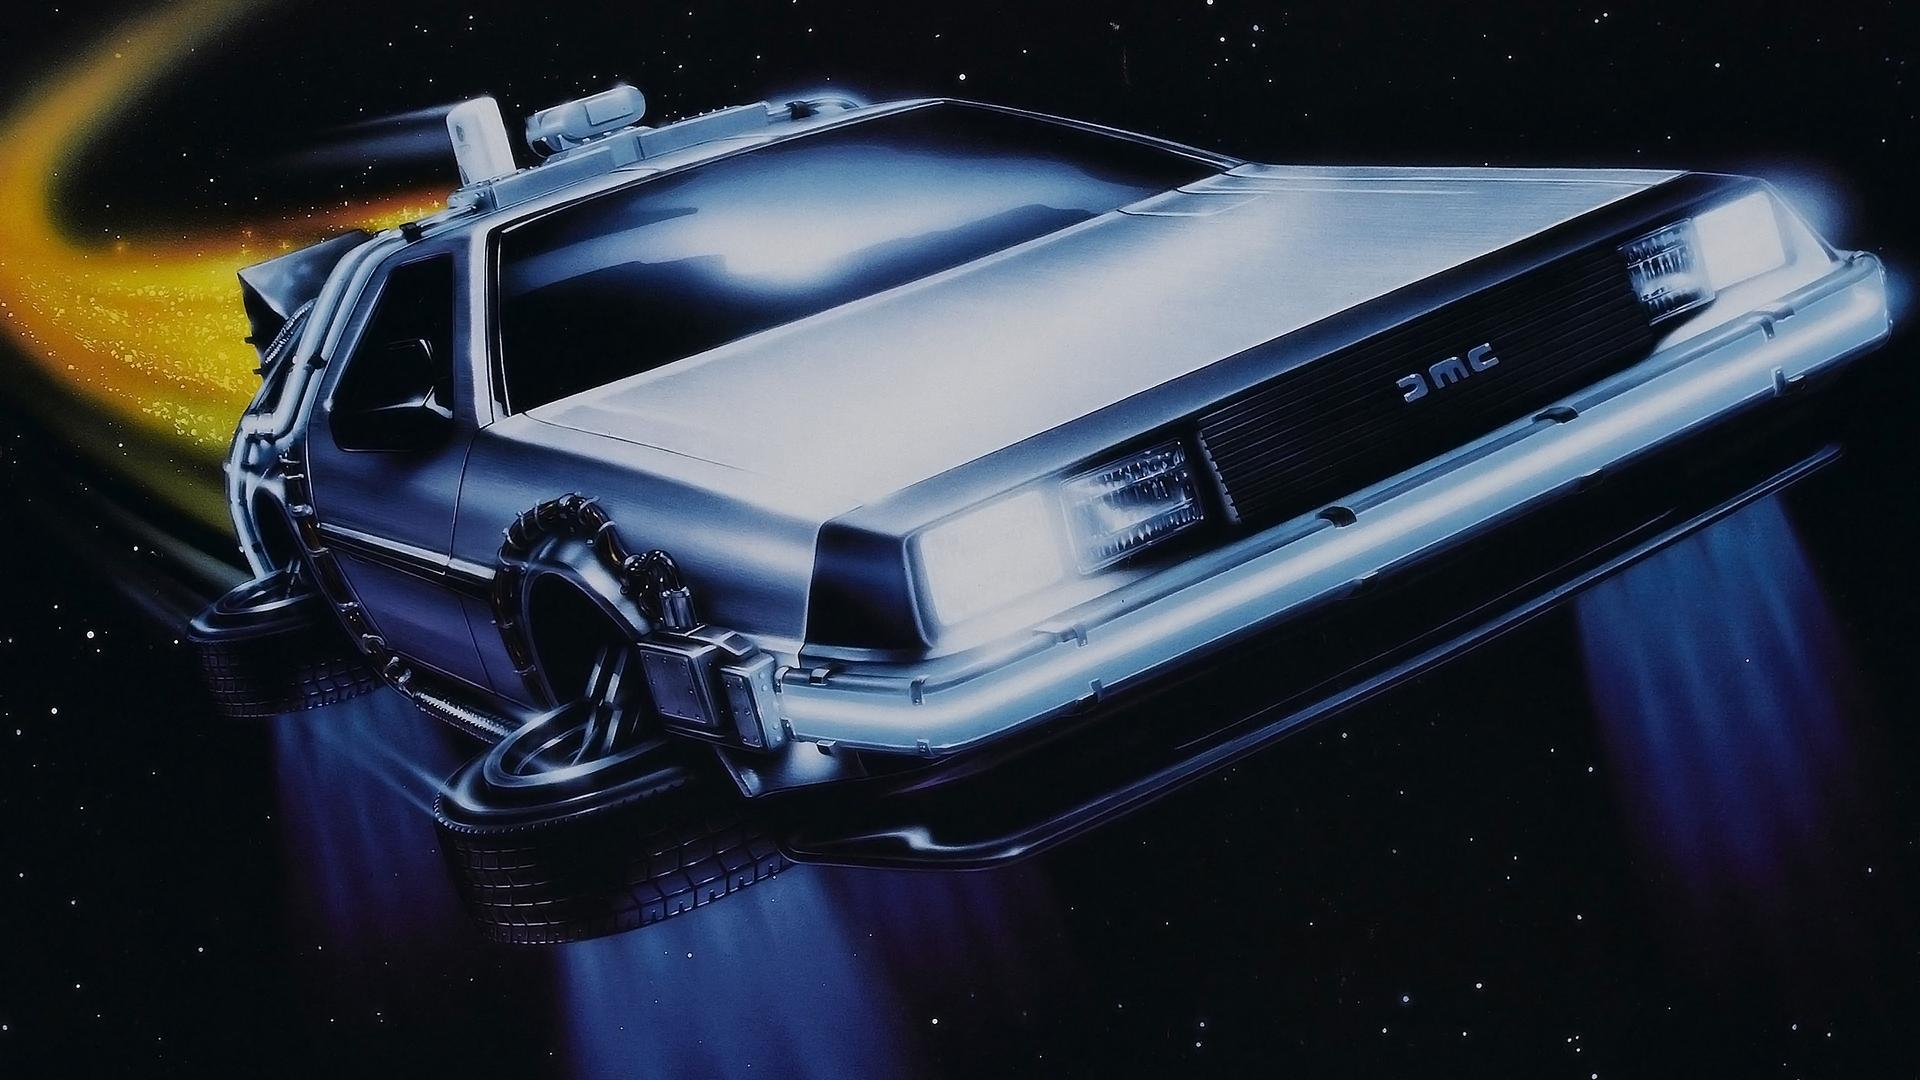 DeLorean   Back to the Future wallpaper by wallconvertcom 1920x1080